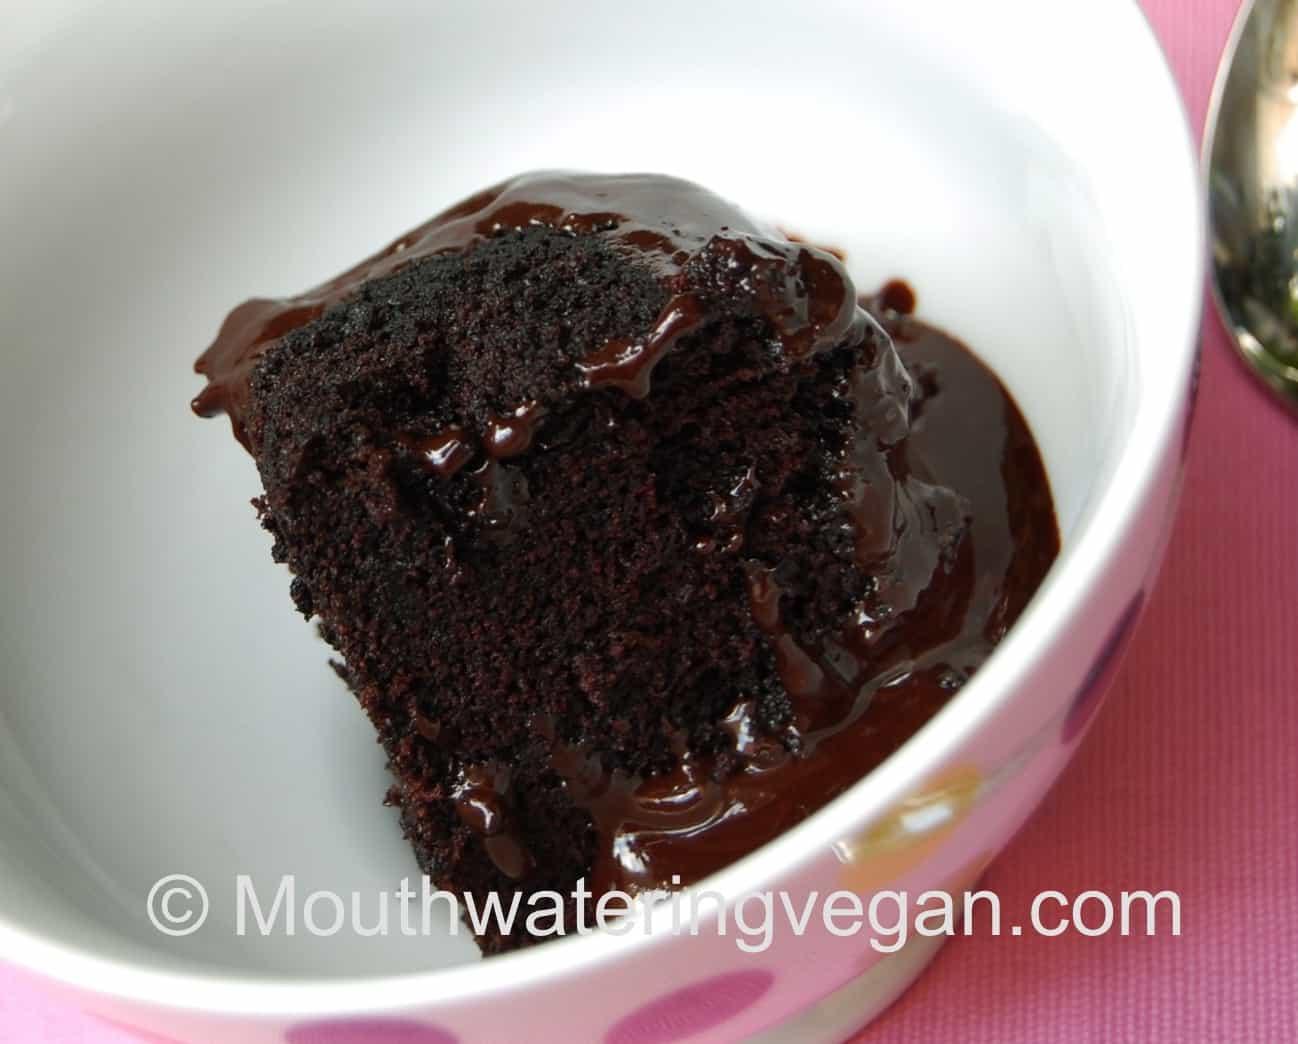 Luscious Red Velvet Moist Chocolate Cake - Mouthwatering Vegan Recipes